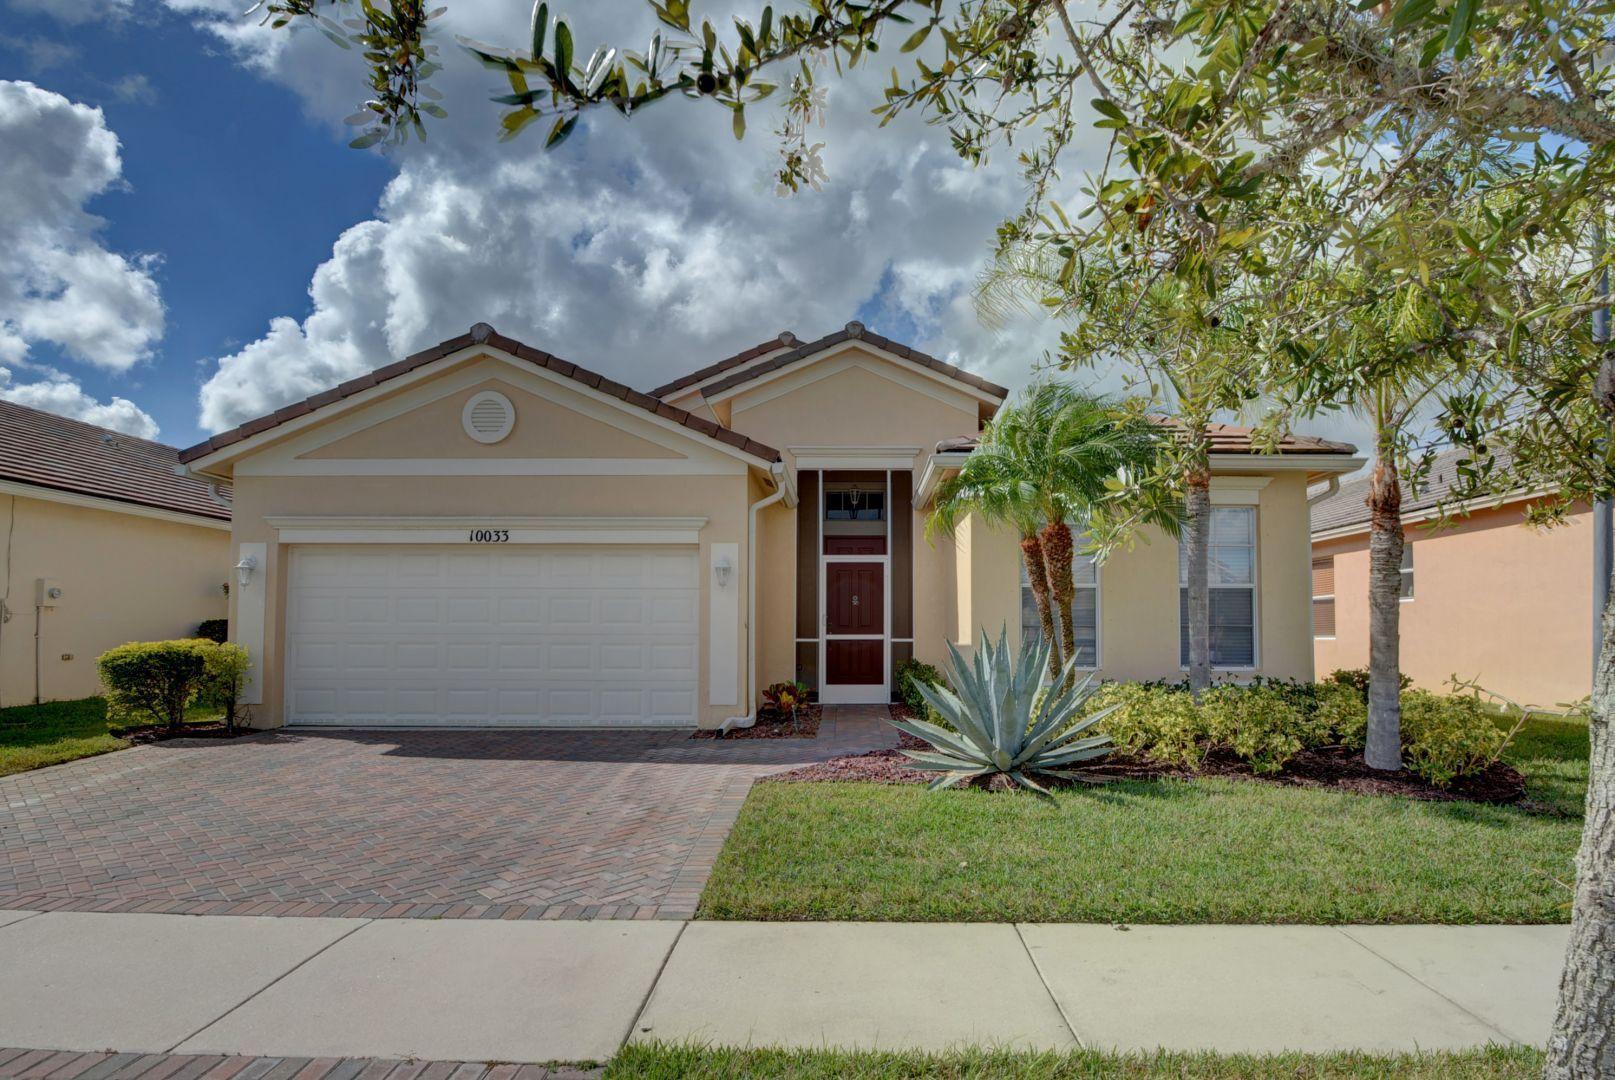 10033 Sw Glenbrook Drive, Port Saint Lucie, FL 34987